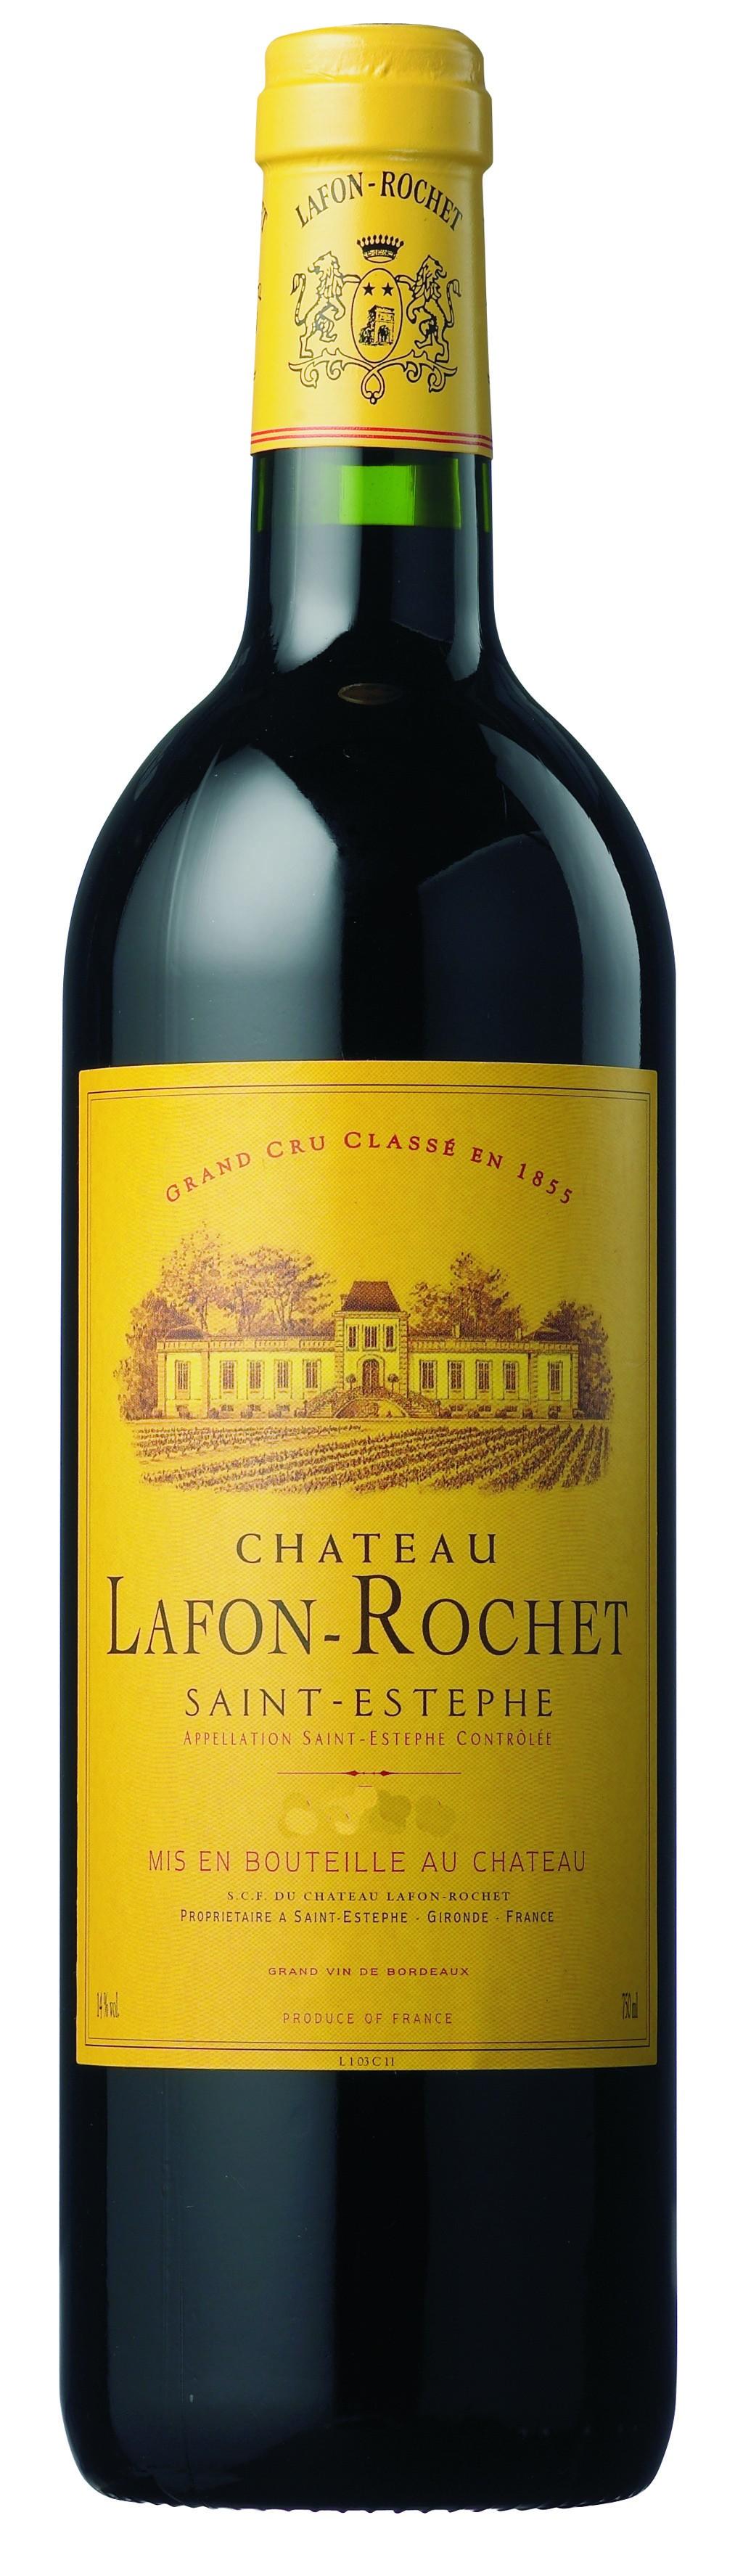 Chateau Lafon Rochet